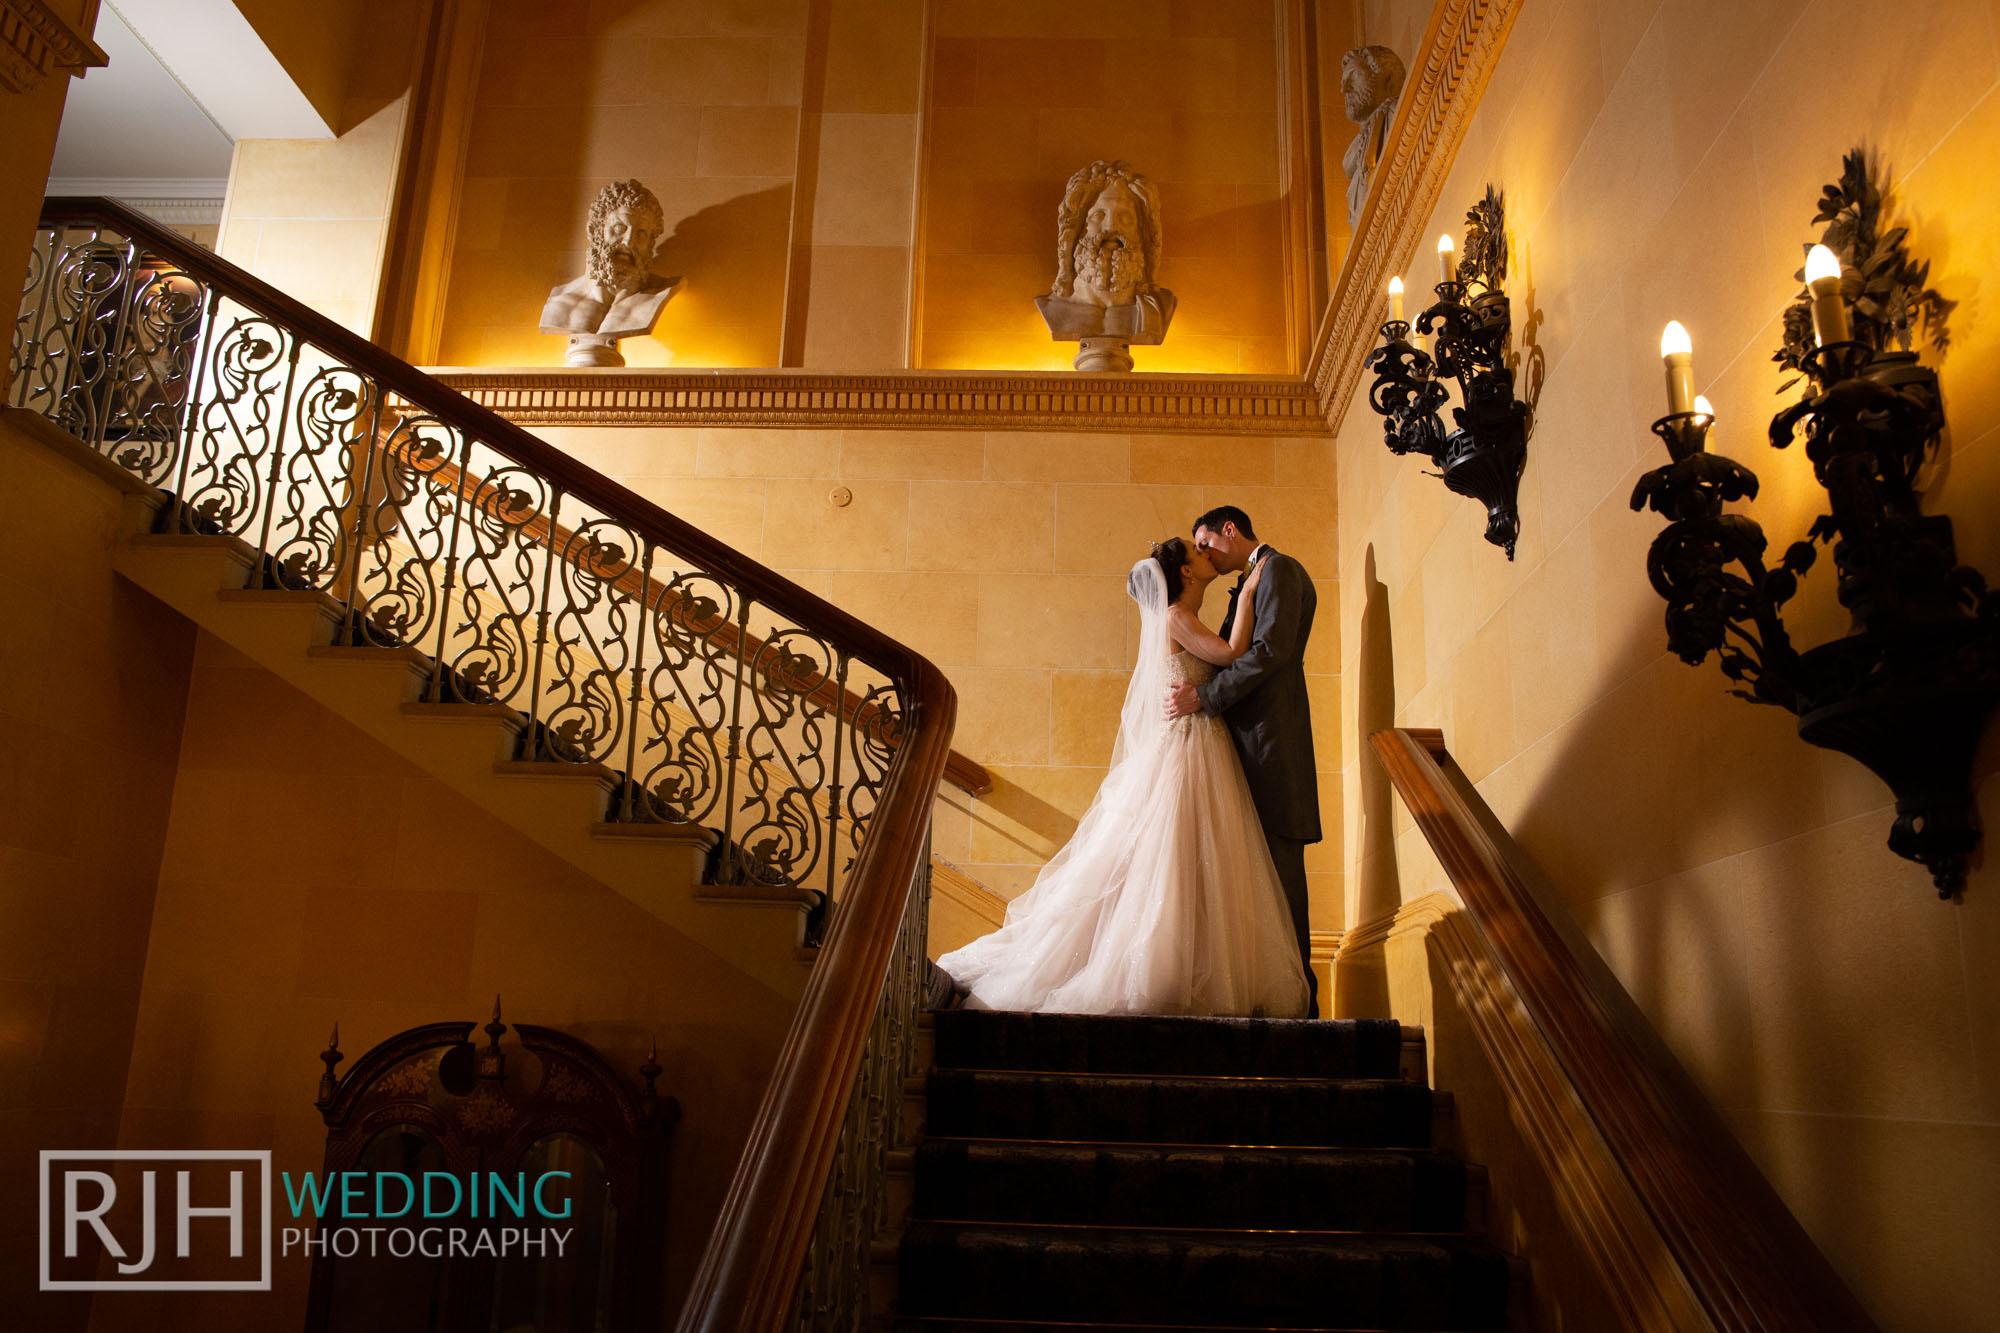 Oulton Hall Wedding Photography_Goodwill-Hall_051_IMG_6900.jpg